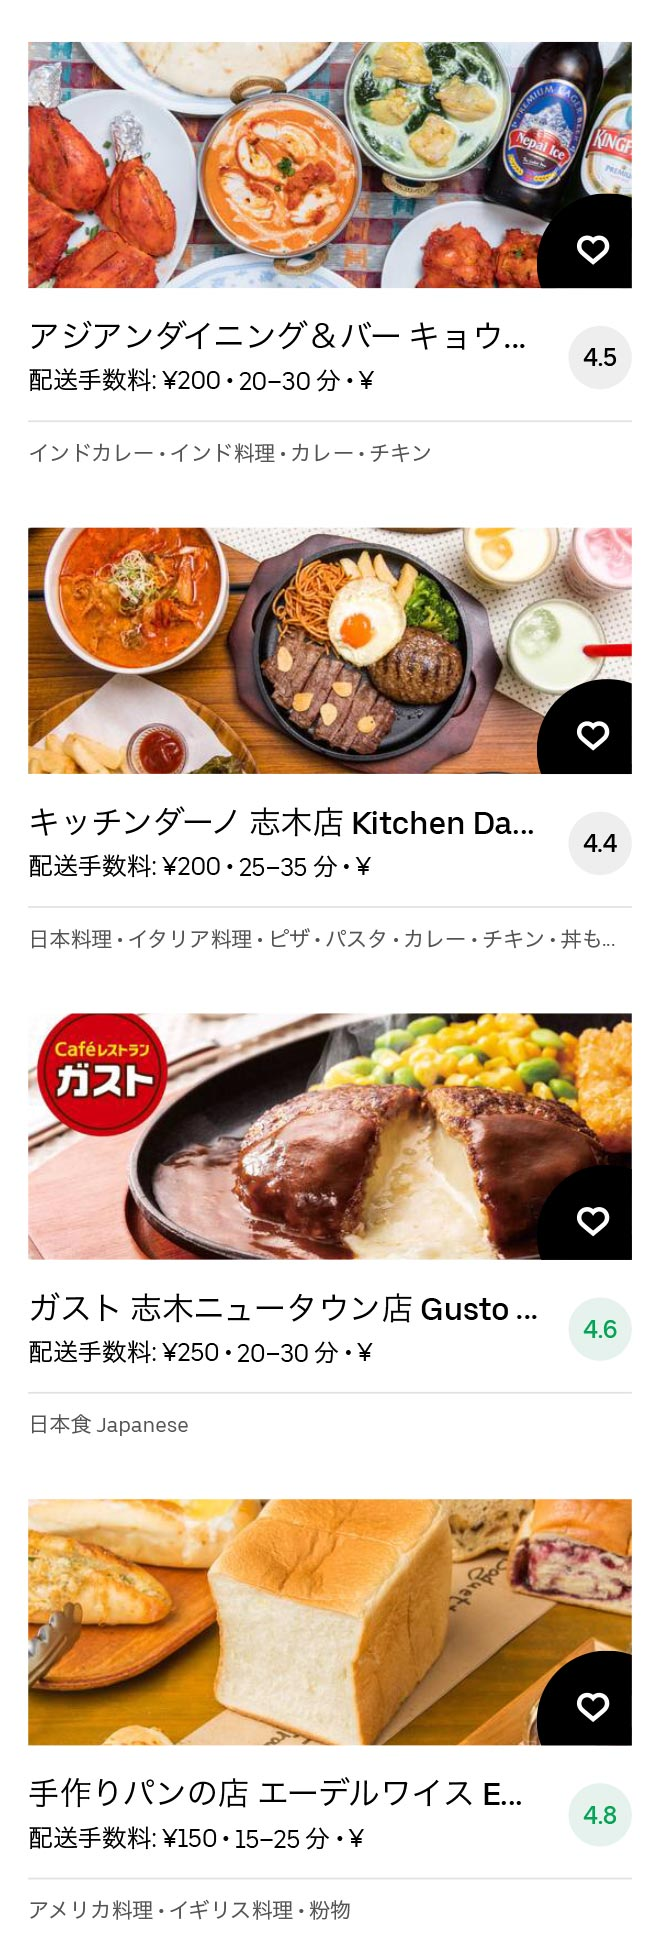 Yanasegawa menu 2011 06